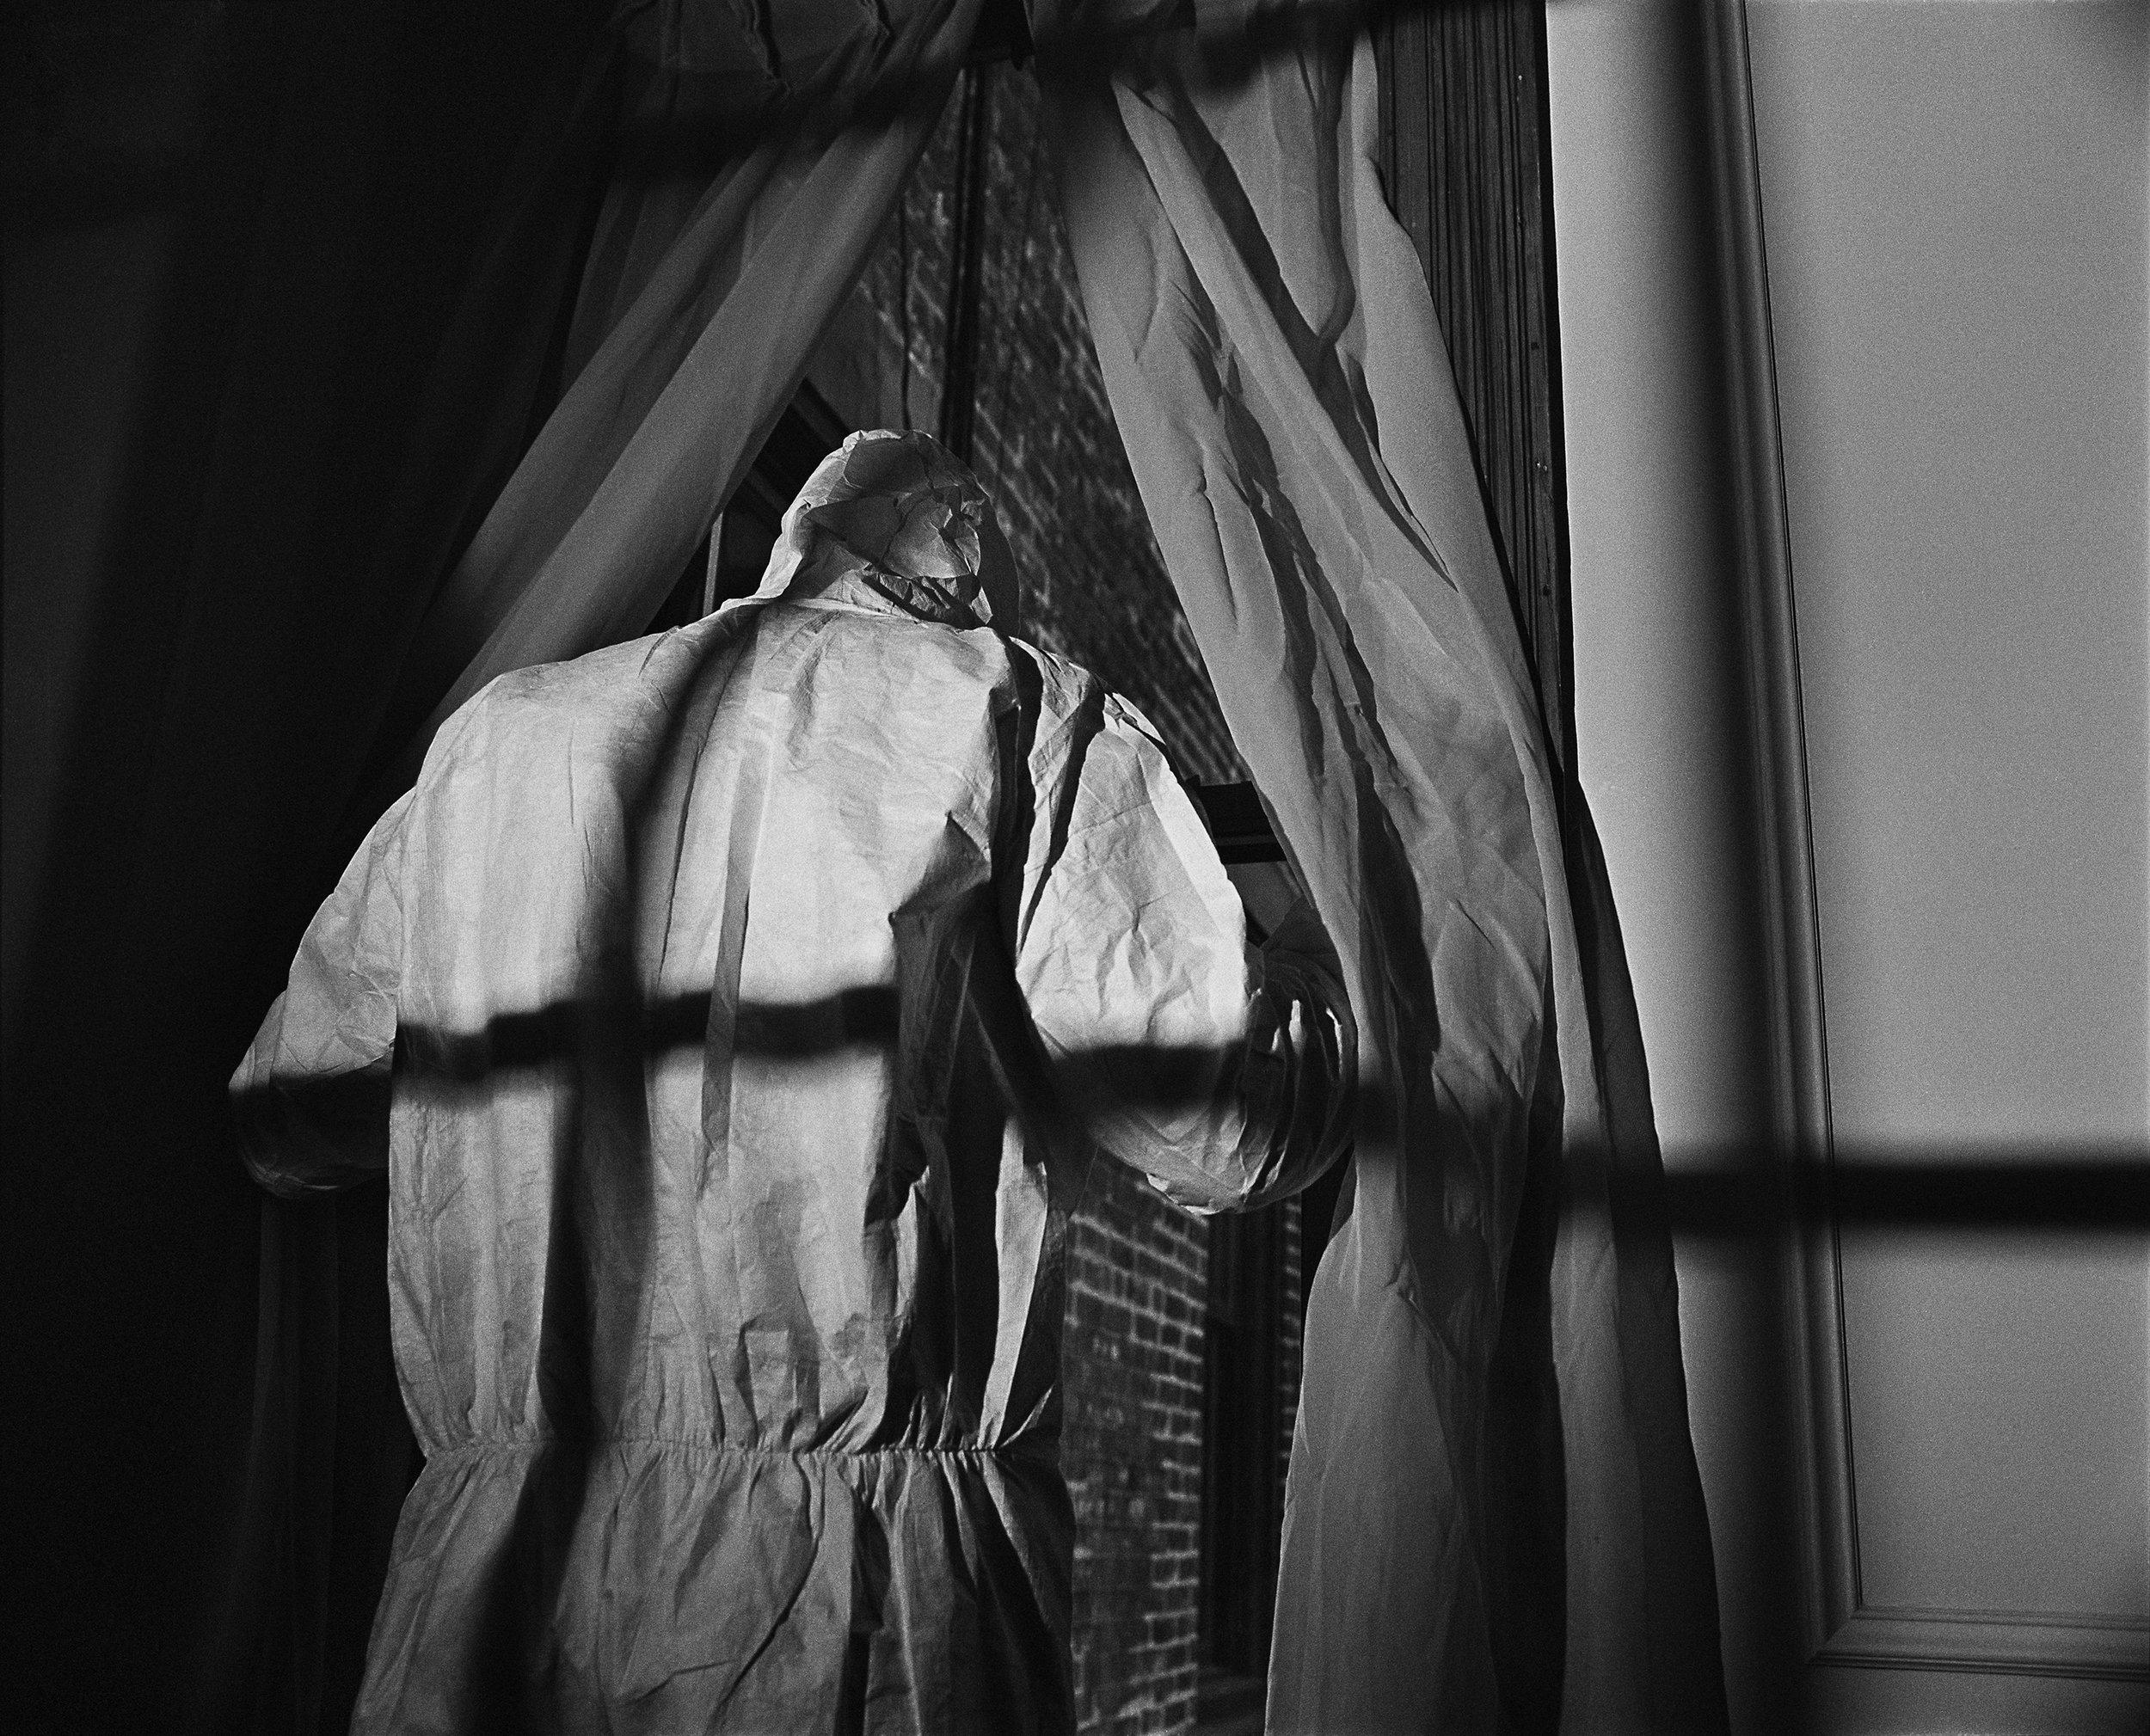 Christian-Window_Grayscale16Bit.jpg